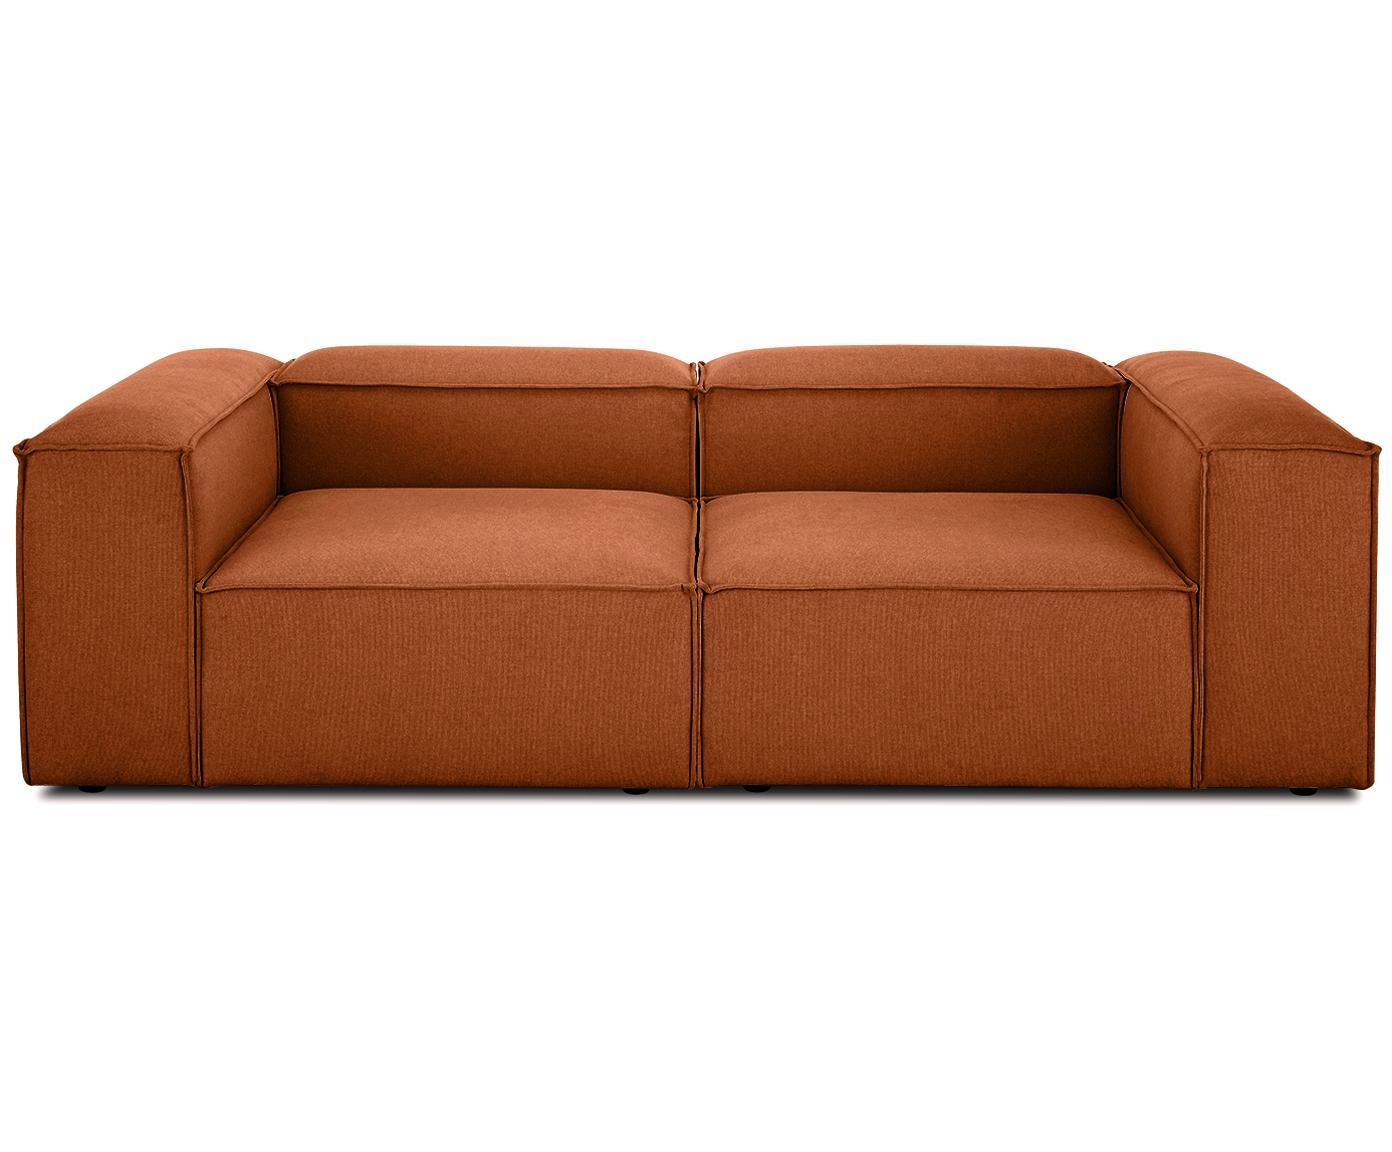 Modulares Sofa Lennon (3-Sitzer), Bezug: Polyester 35.000 Scheuert, Gestell: Massives Kiefernholz, Spe, Webstoff Terrakotta, B 238 x T 119 cm